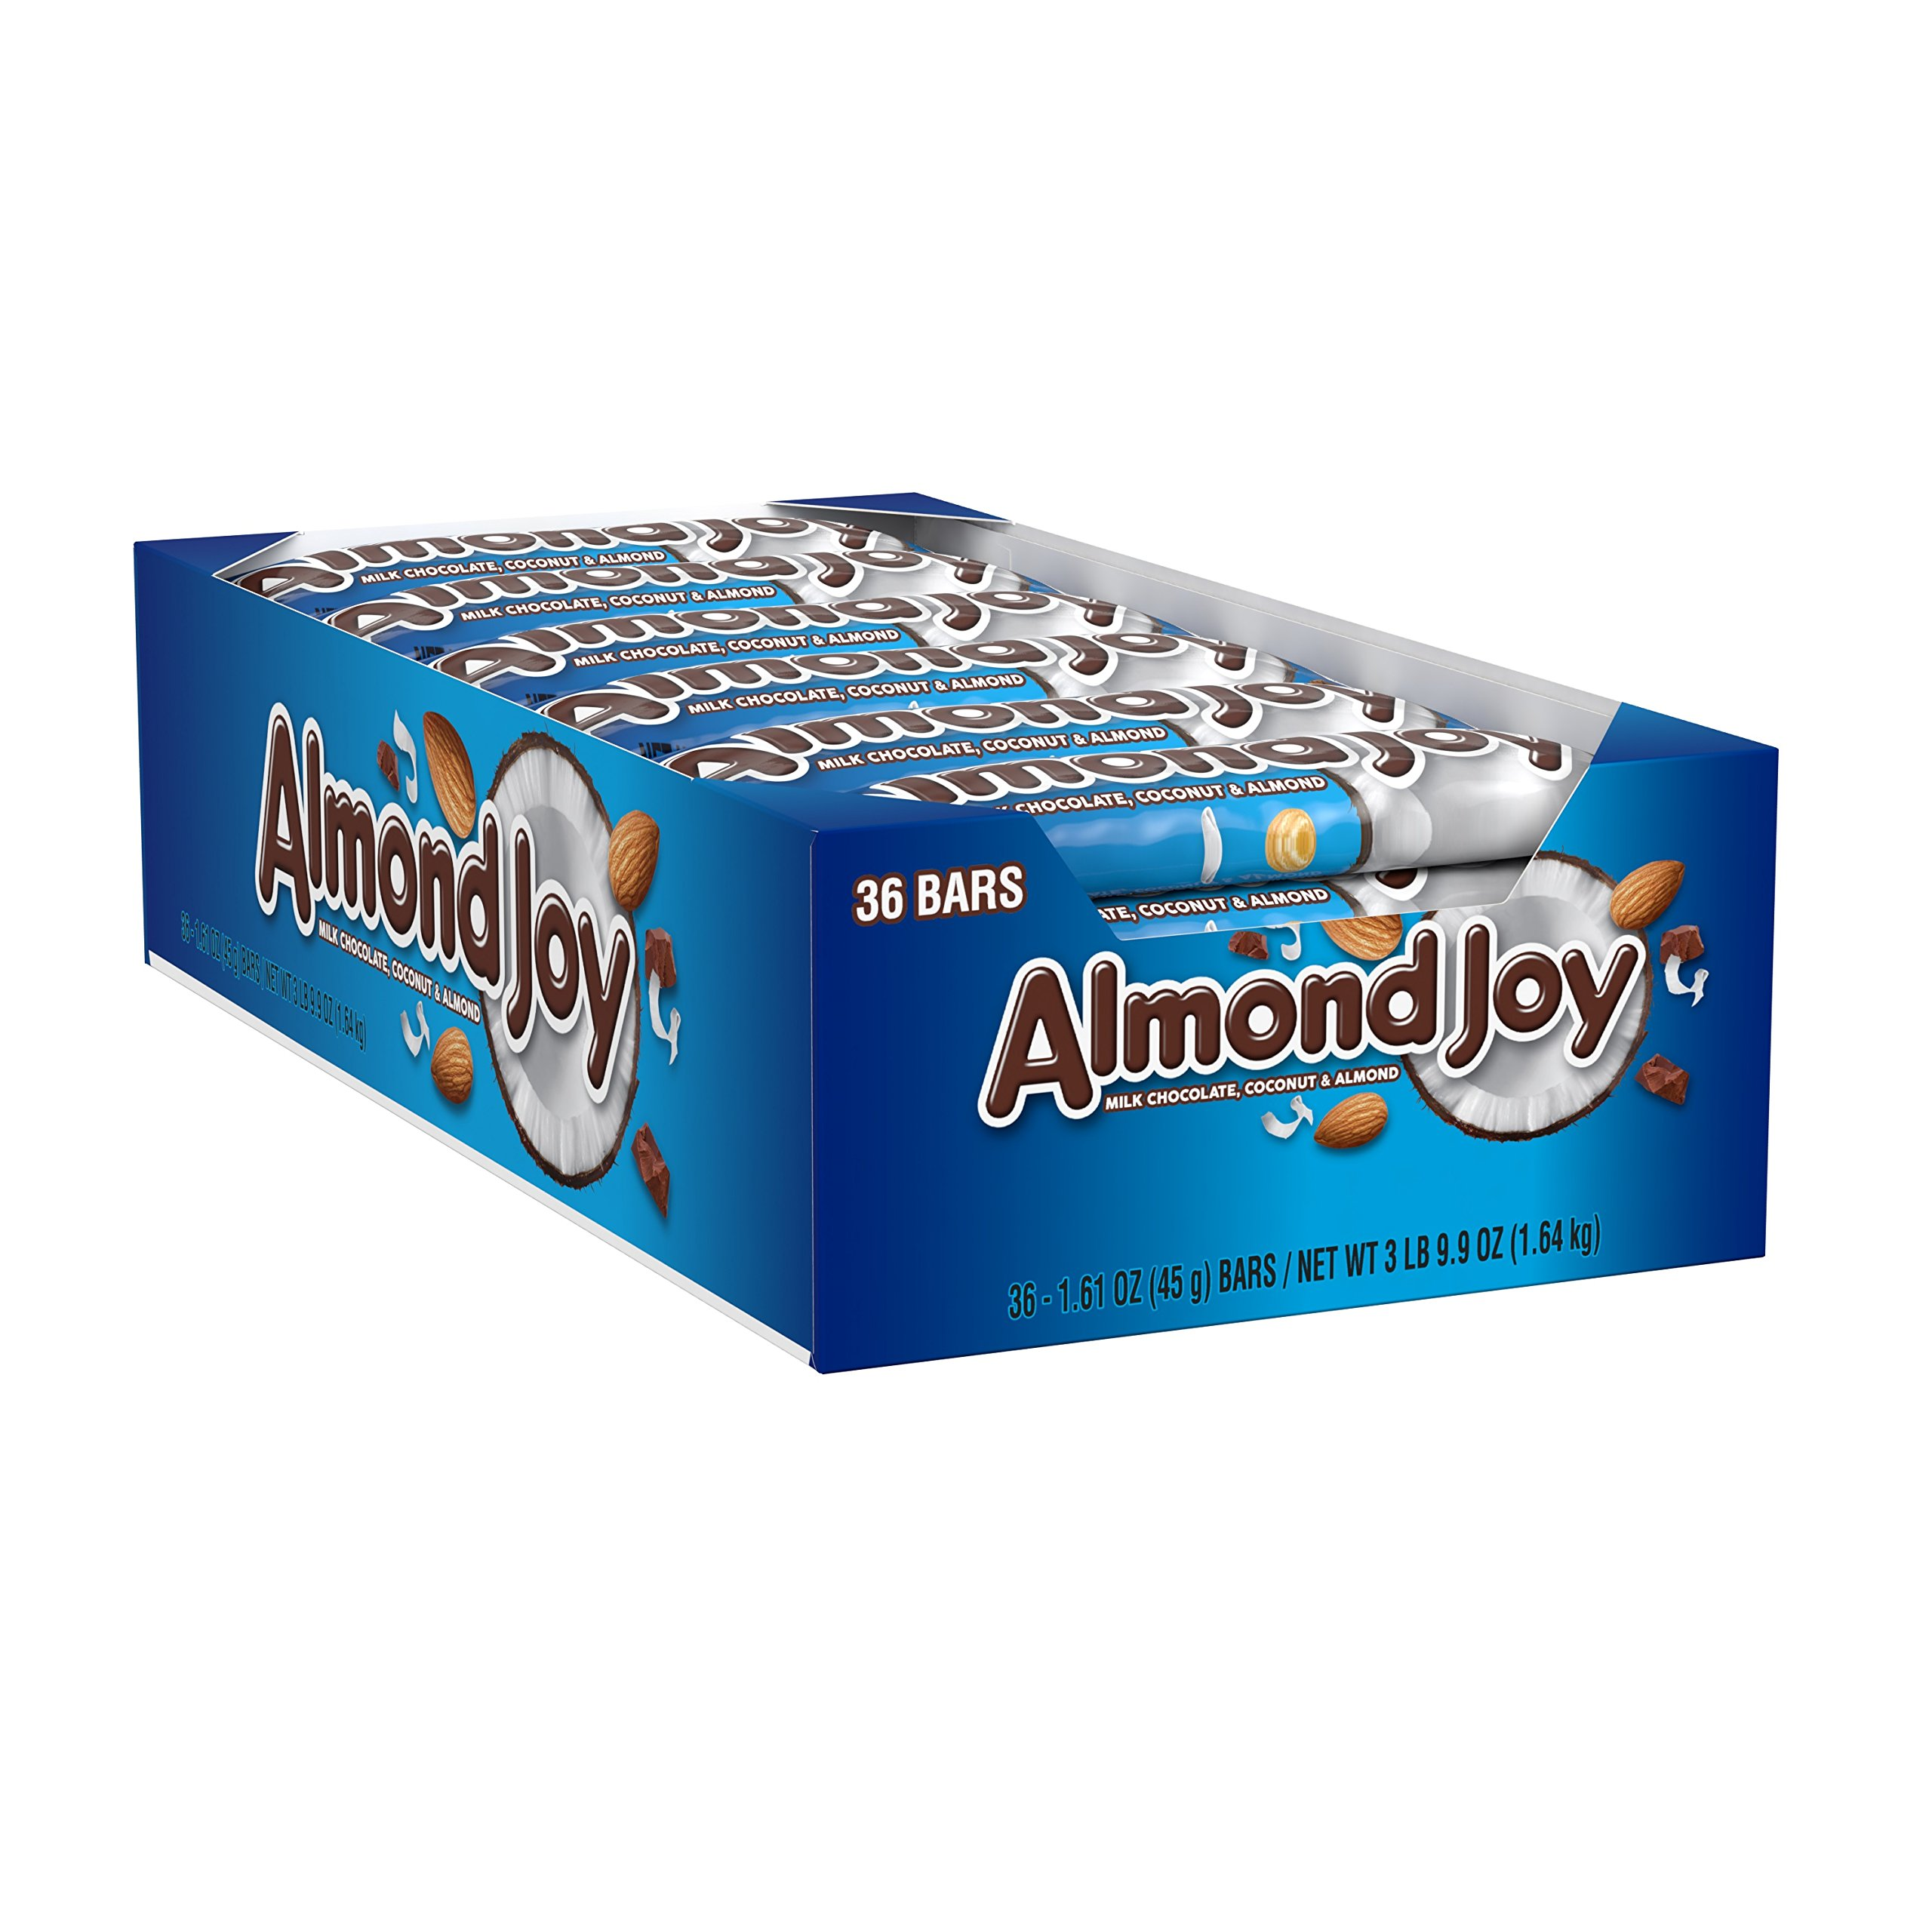 ALMOND JOY, Chocolate Coconut Candy Bar (Pack of 36) by Almond Joy